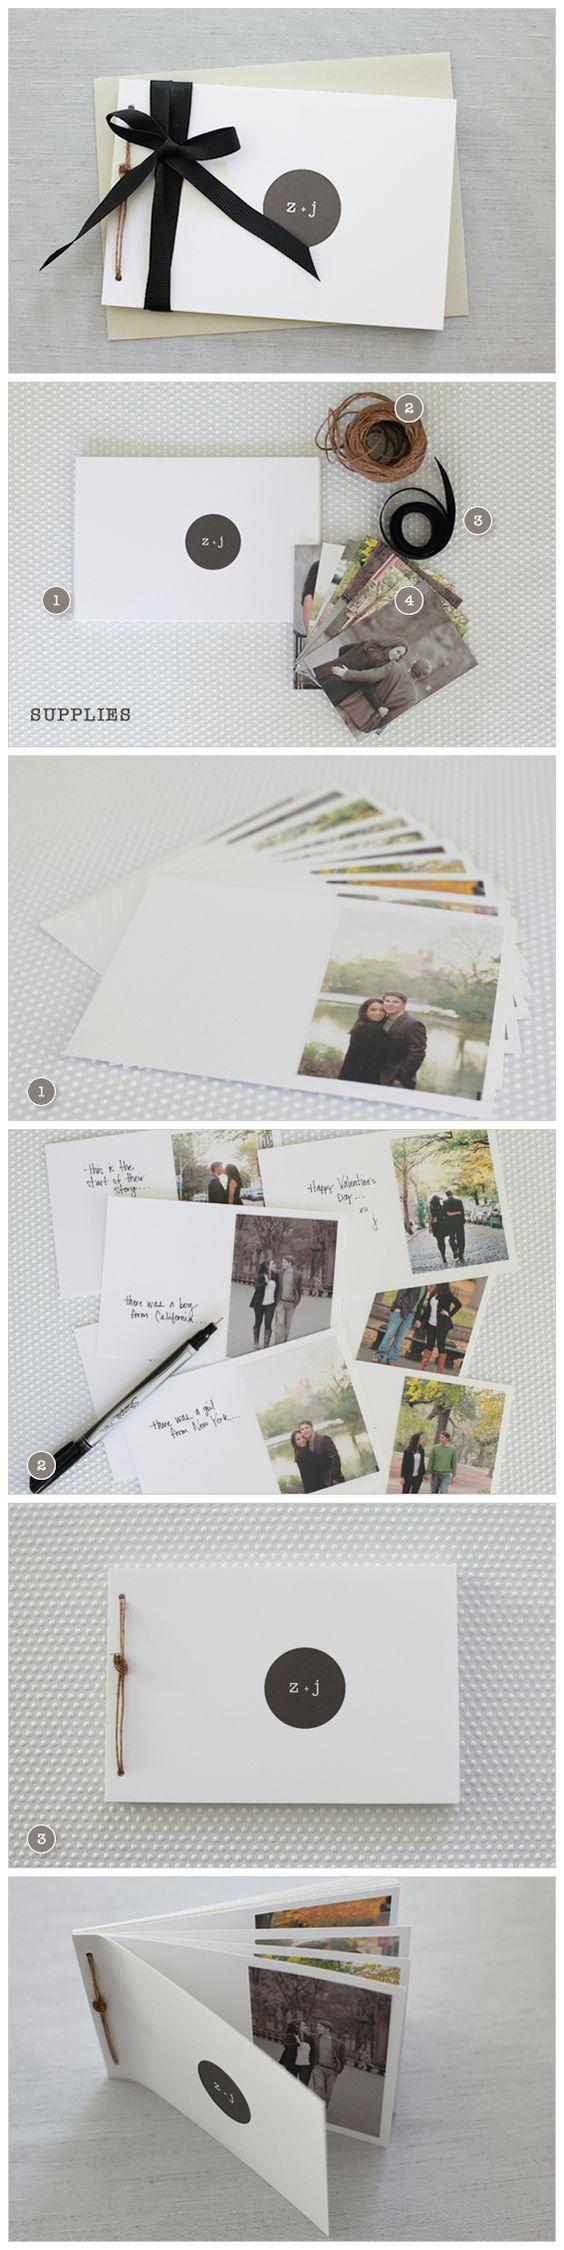 Do It Yourself Valentine Love Book - http://www.weddingchicks.com/2011/01/27/diy-valentines-love-book/